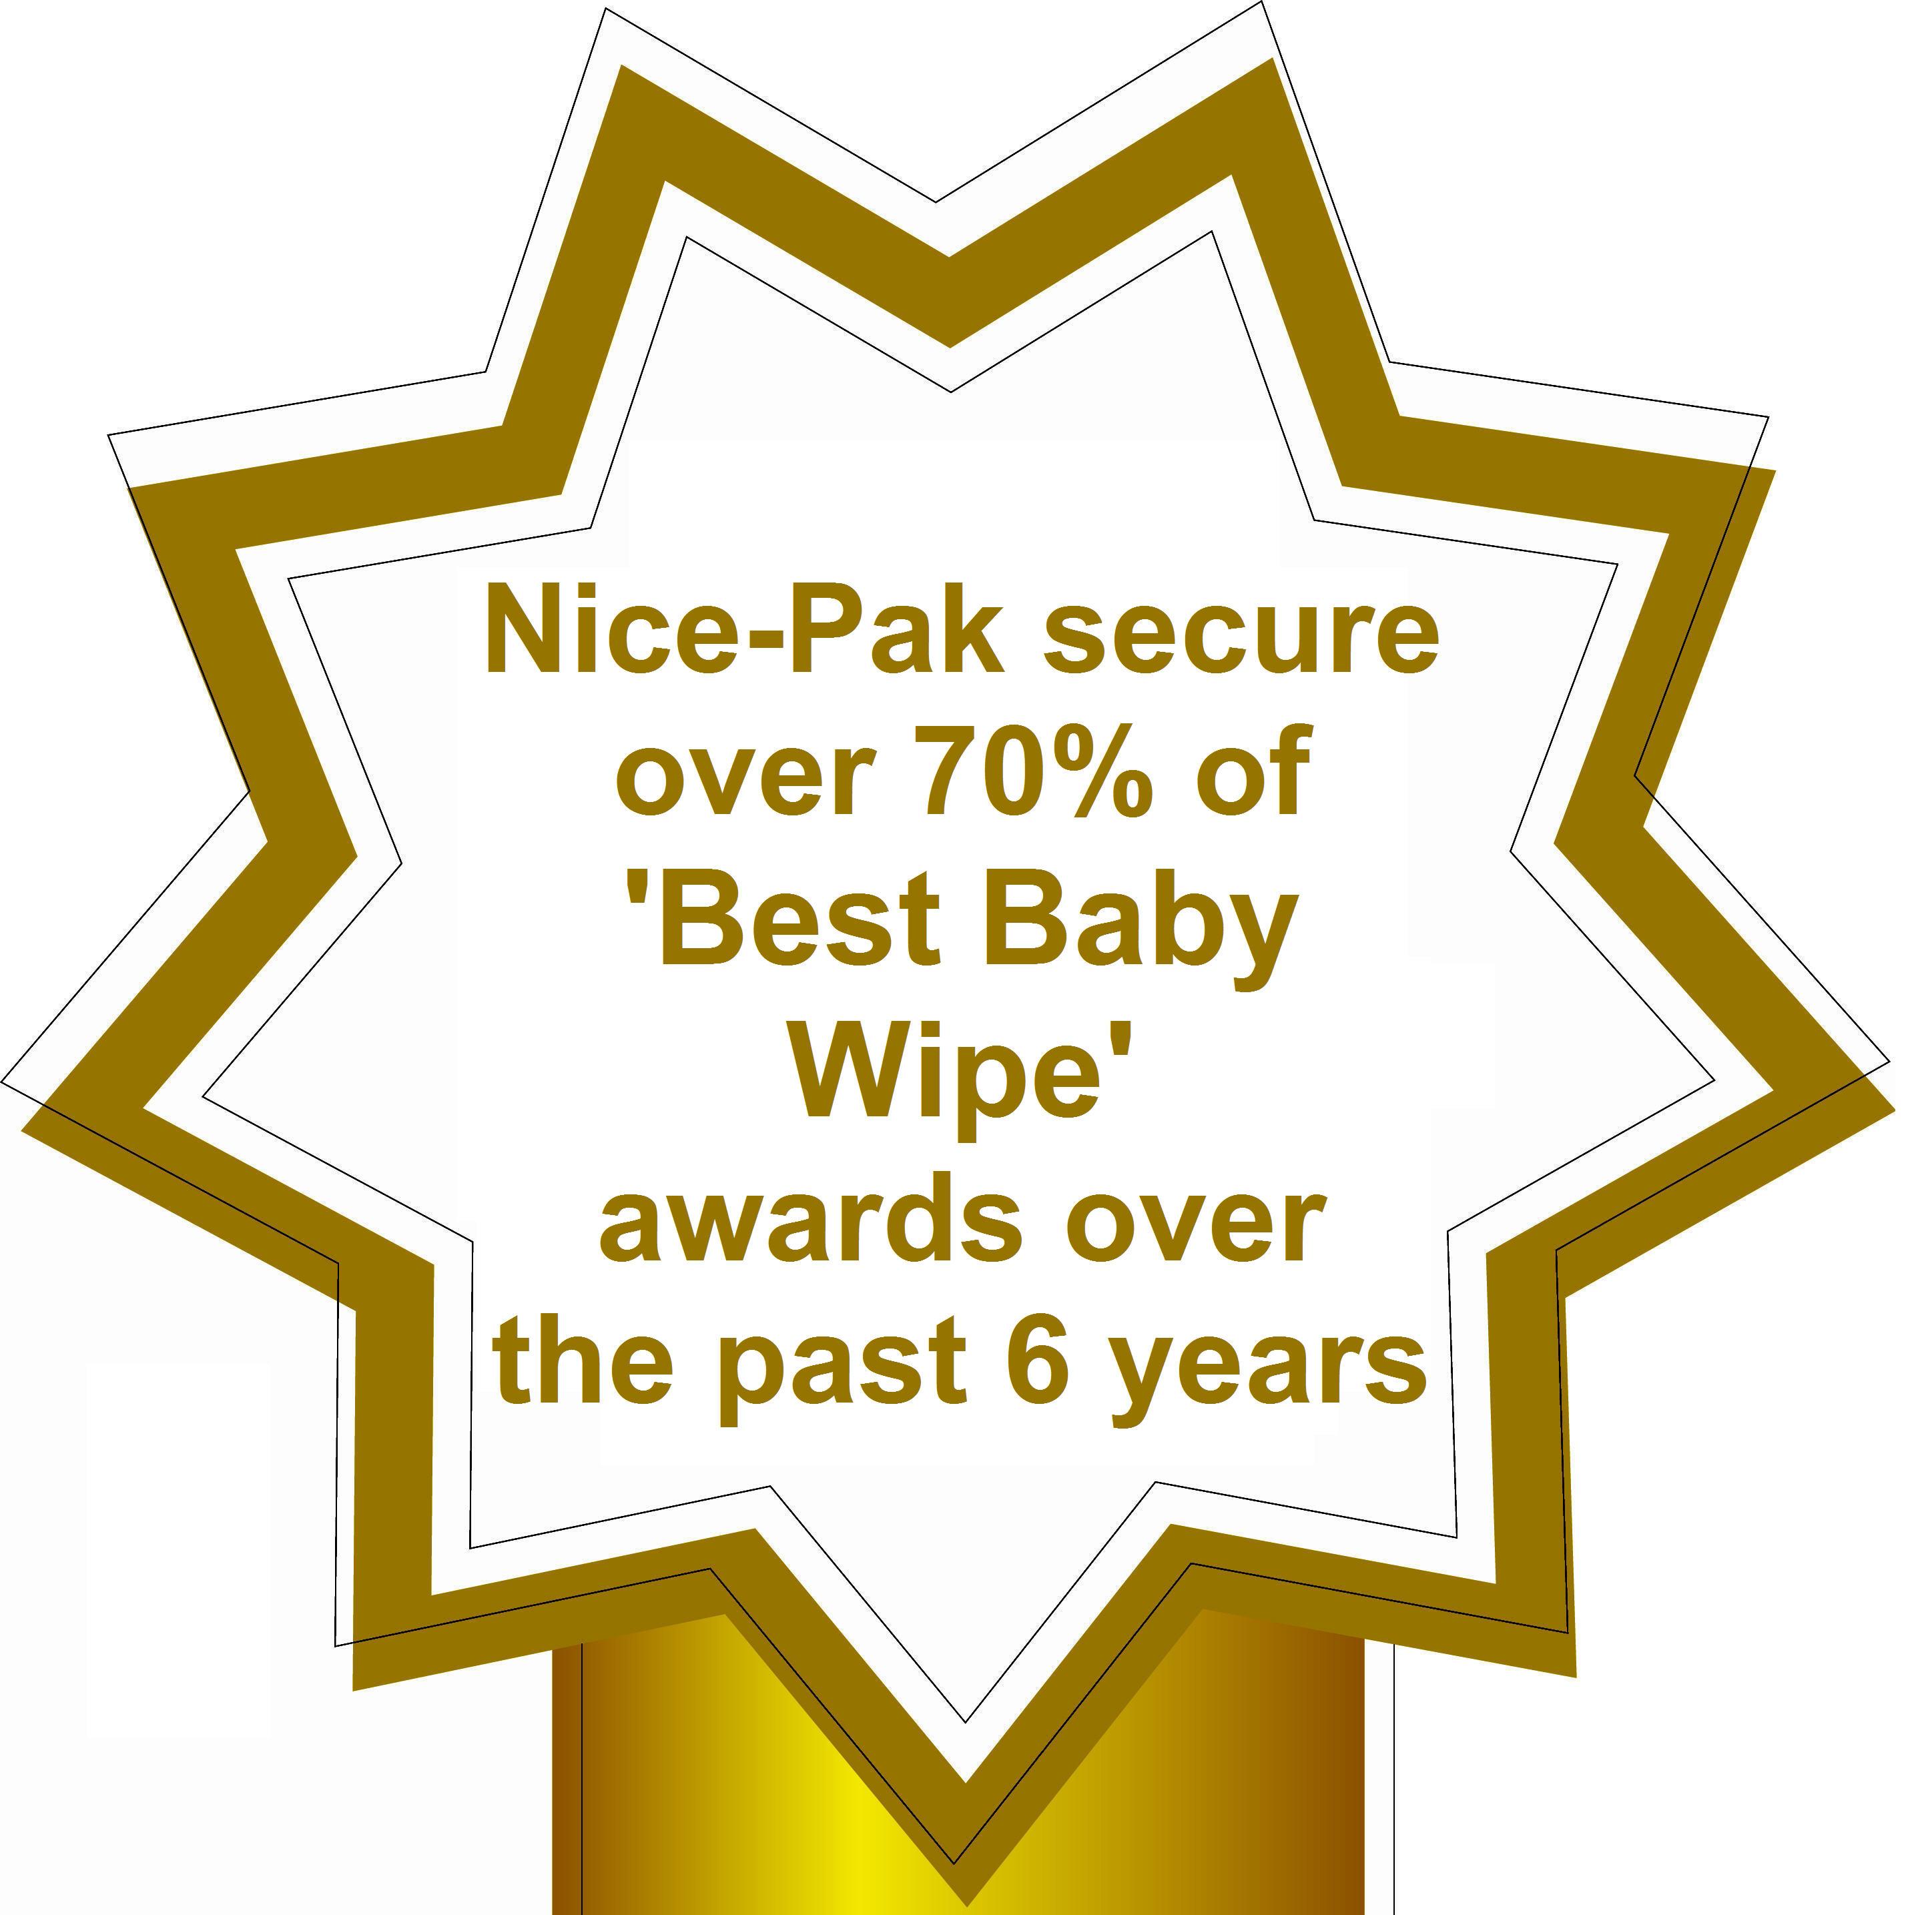 Best baby wipe awards